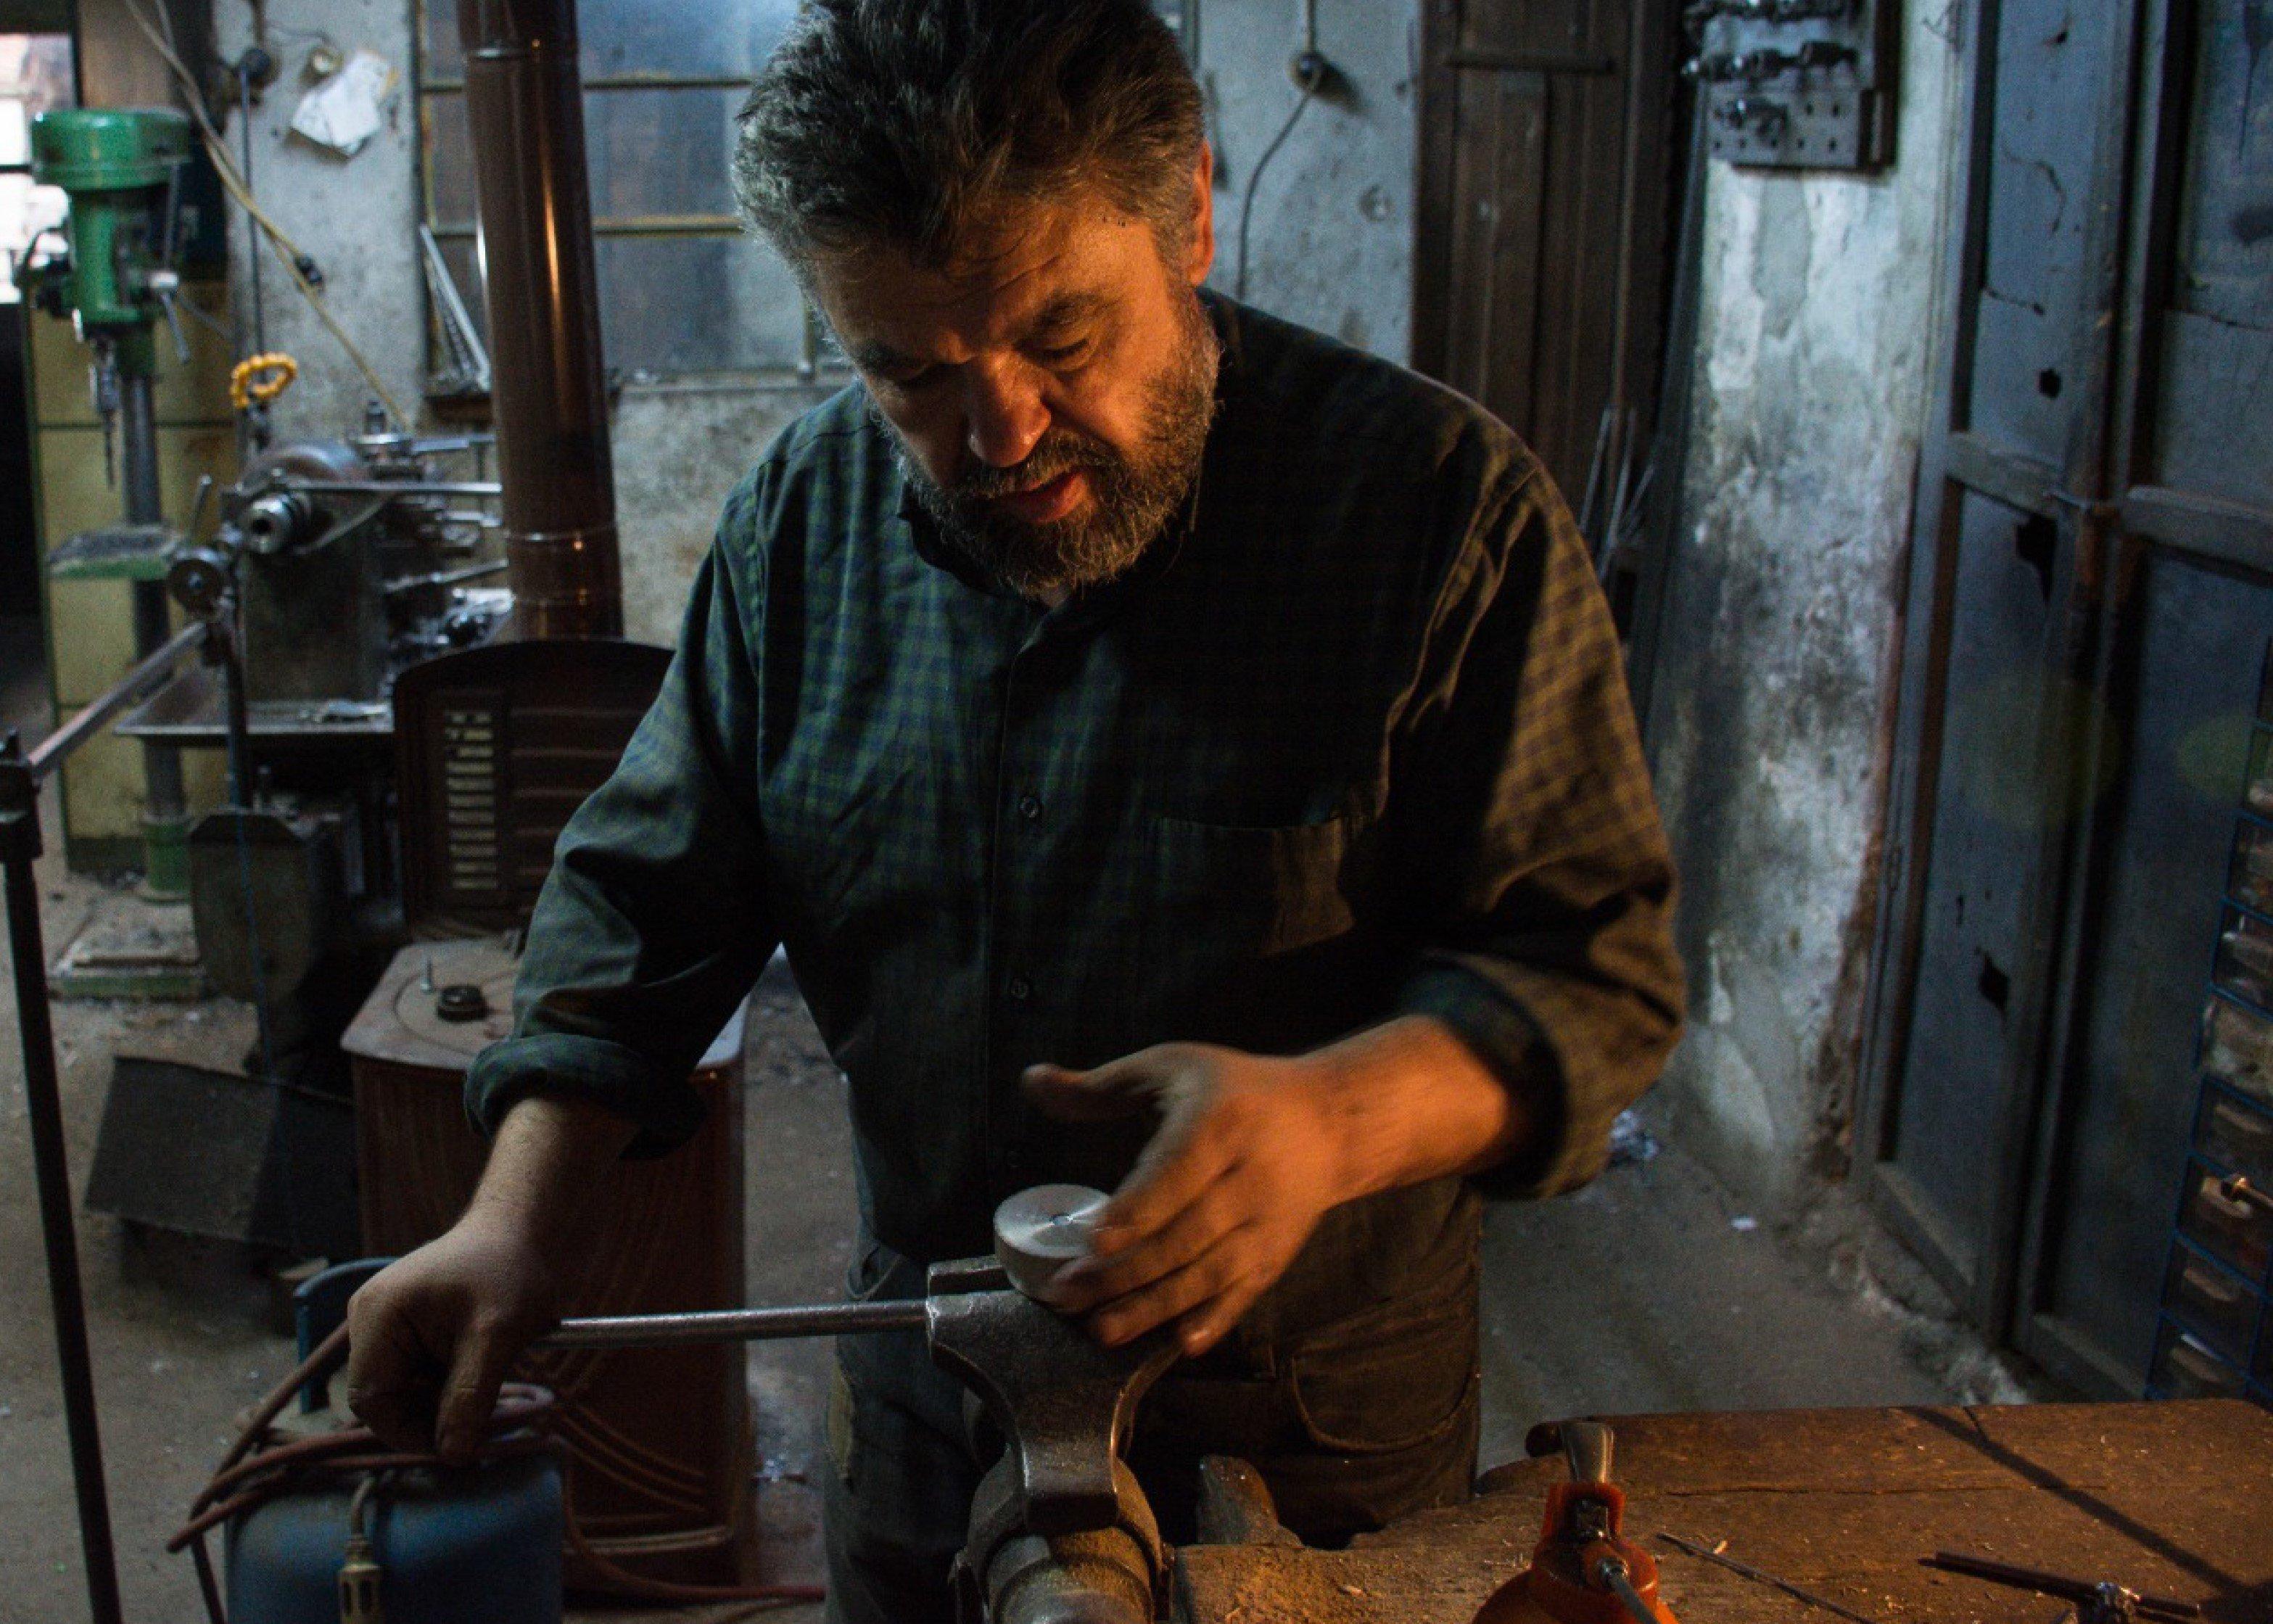 Aydoğan Aslan uses a lathe machine in his workshop. (AA Photo)